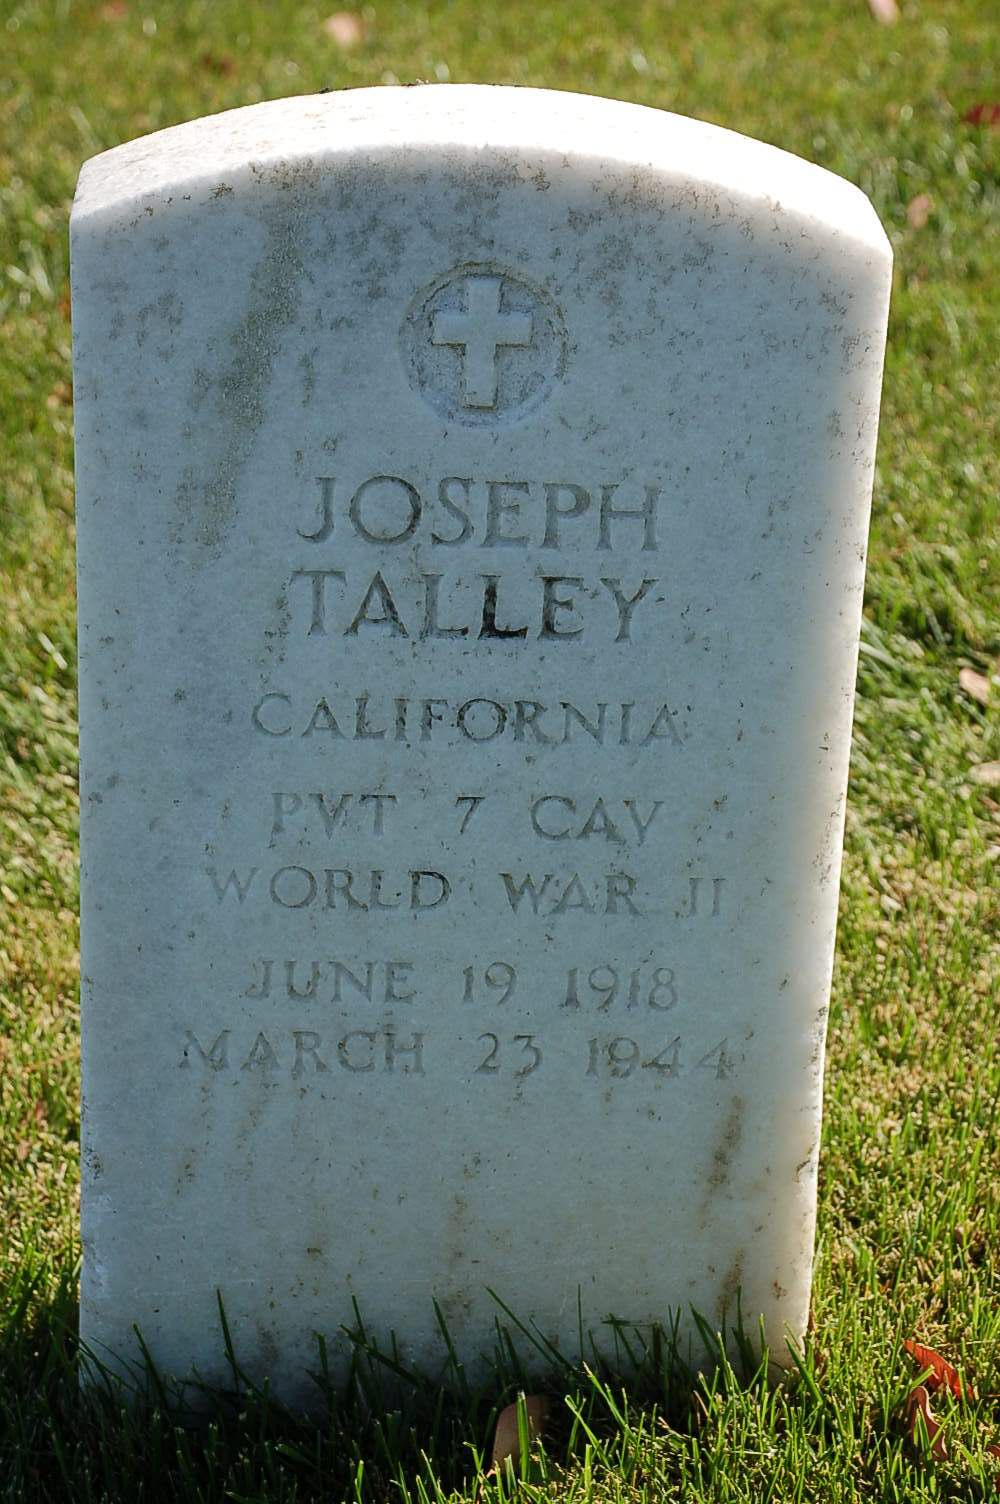 Joseph Talley